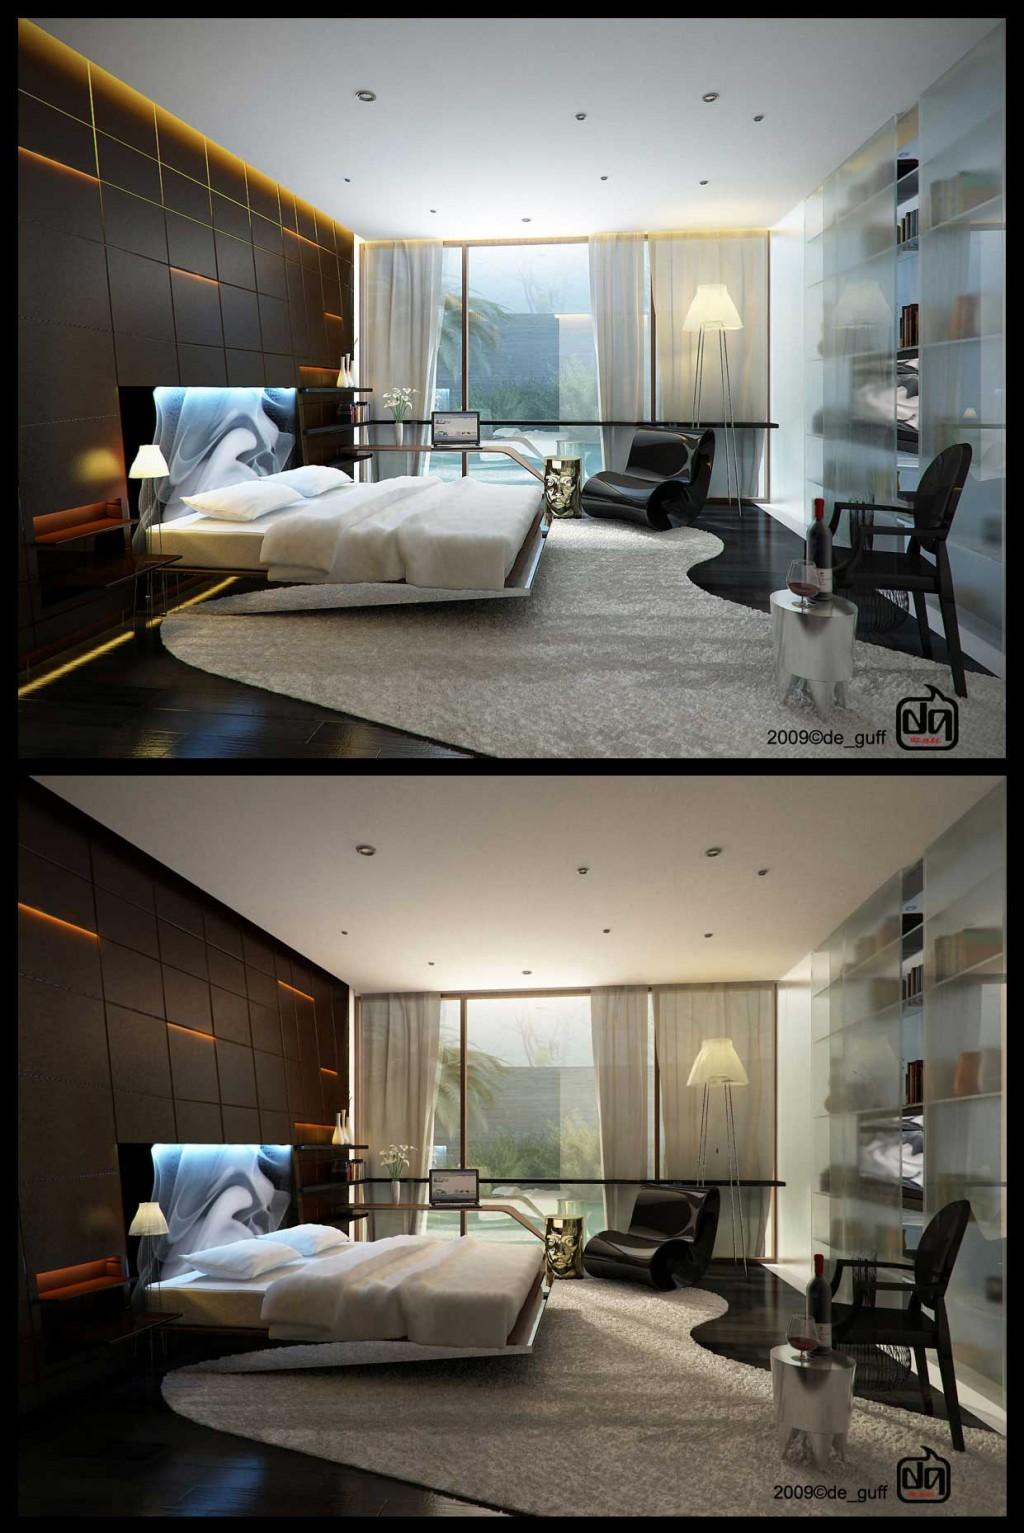 Cool bedroom accent lighting beautiful area rug interior design ideas - Cool bedroom lighting ...